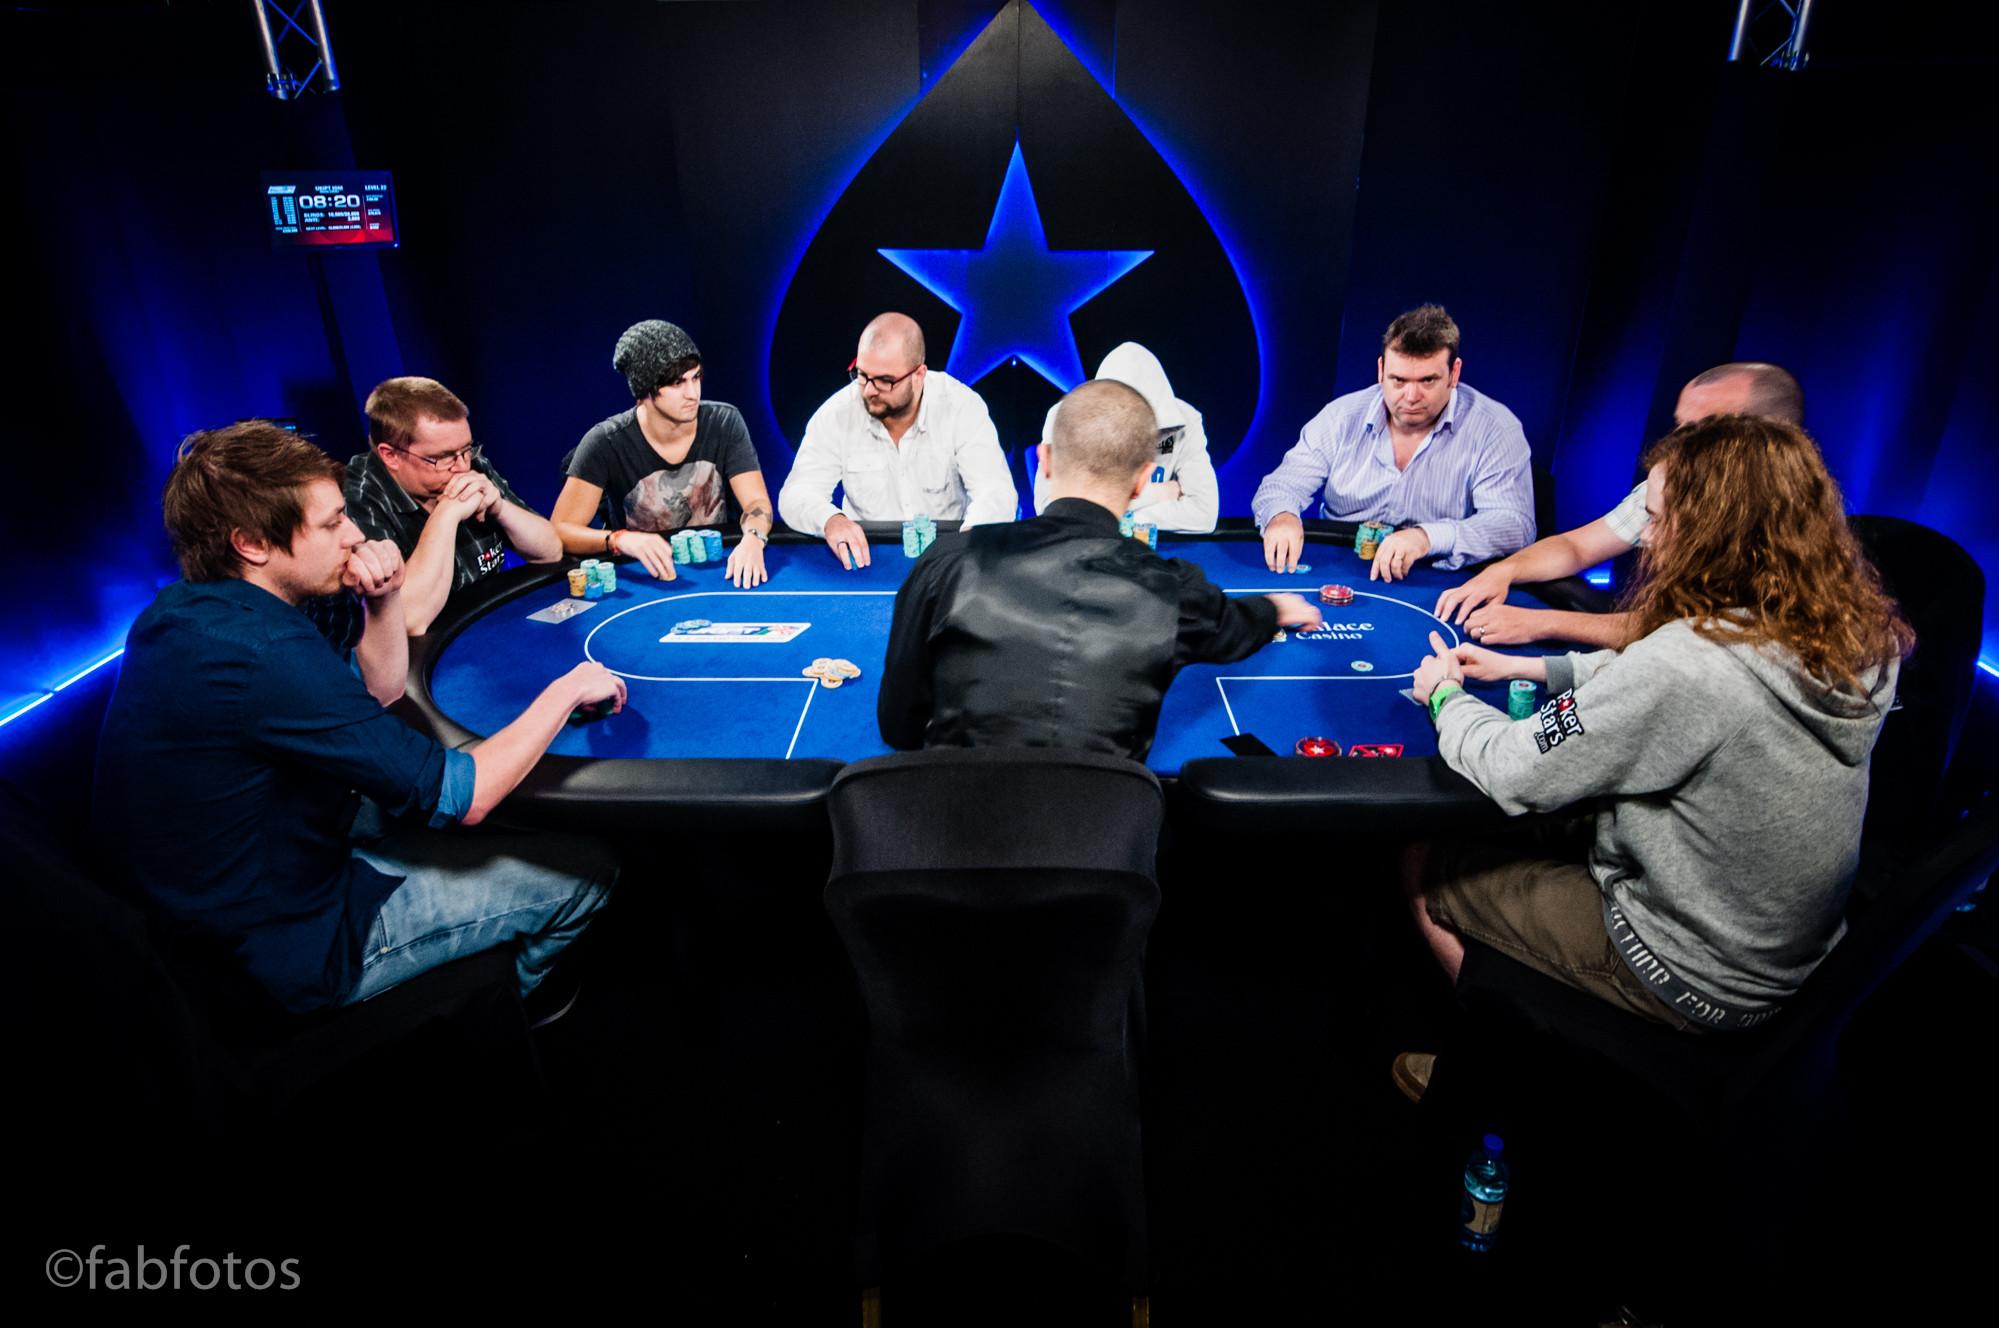 Win poker tournaments